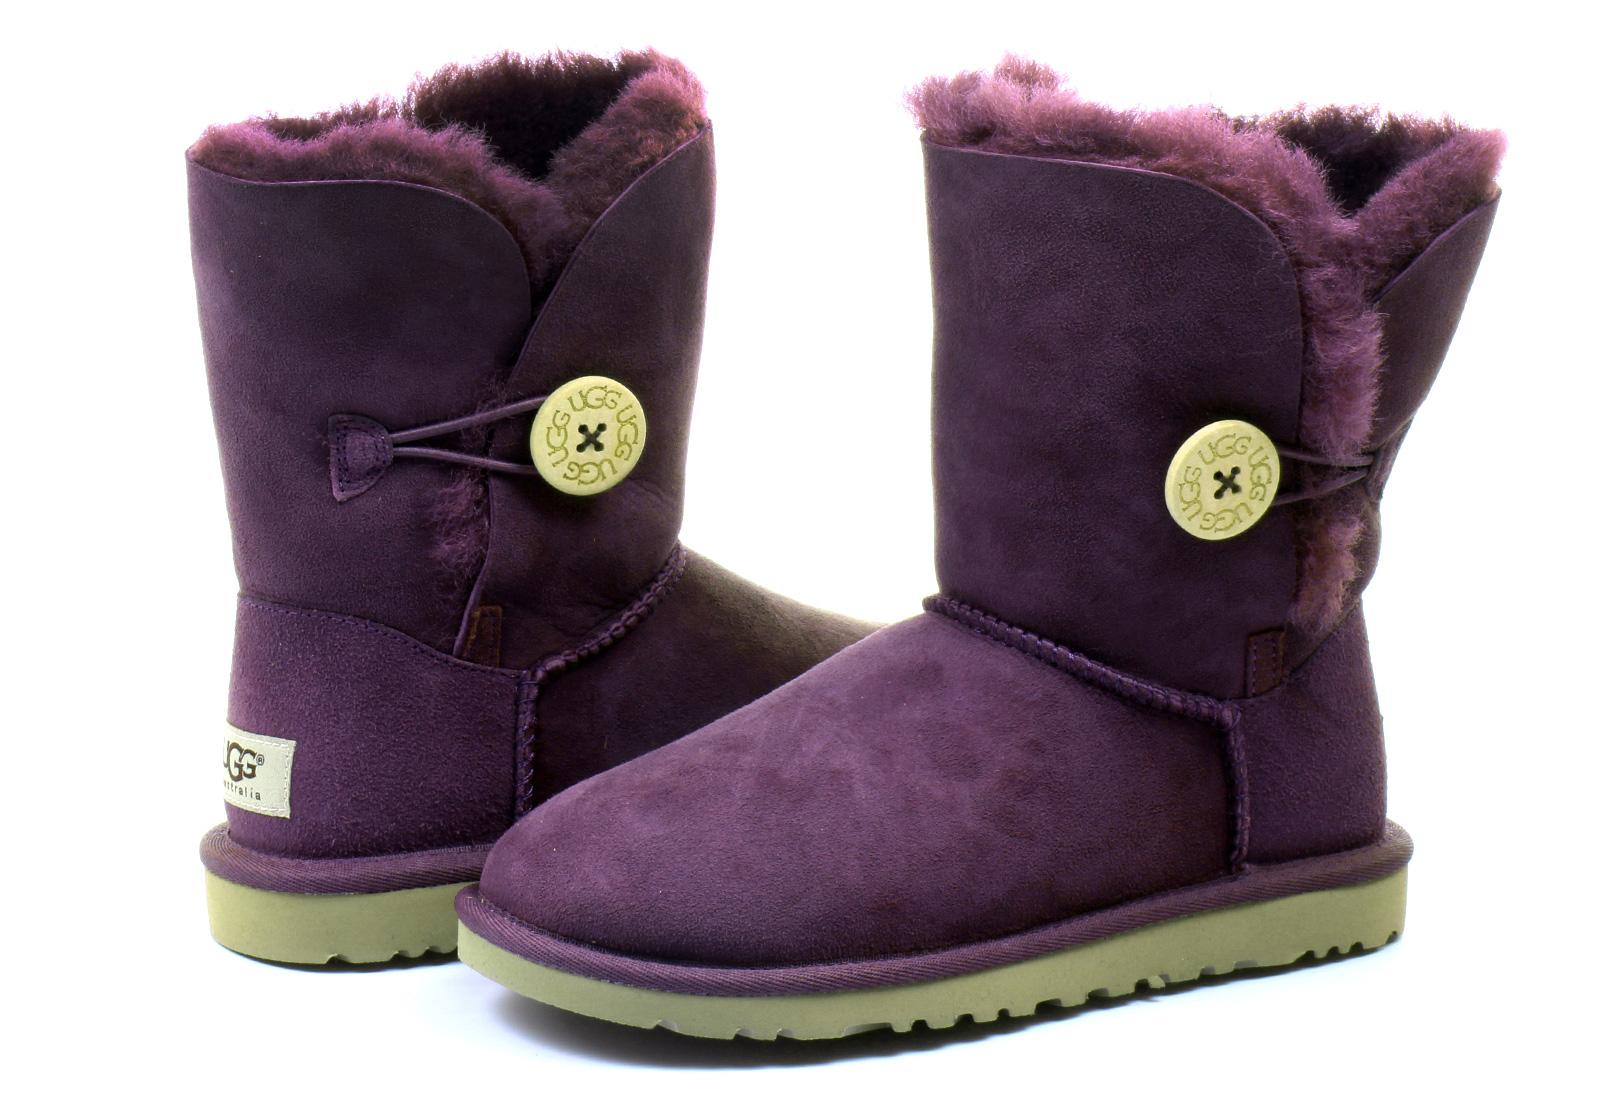 UGG Men Bailey Button 5803 Sand Boots